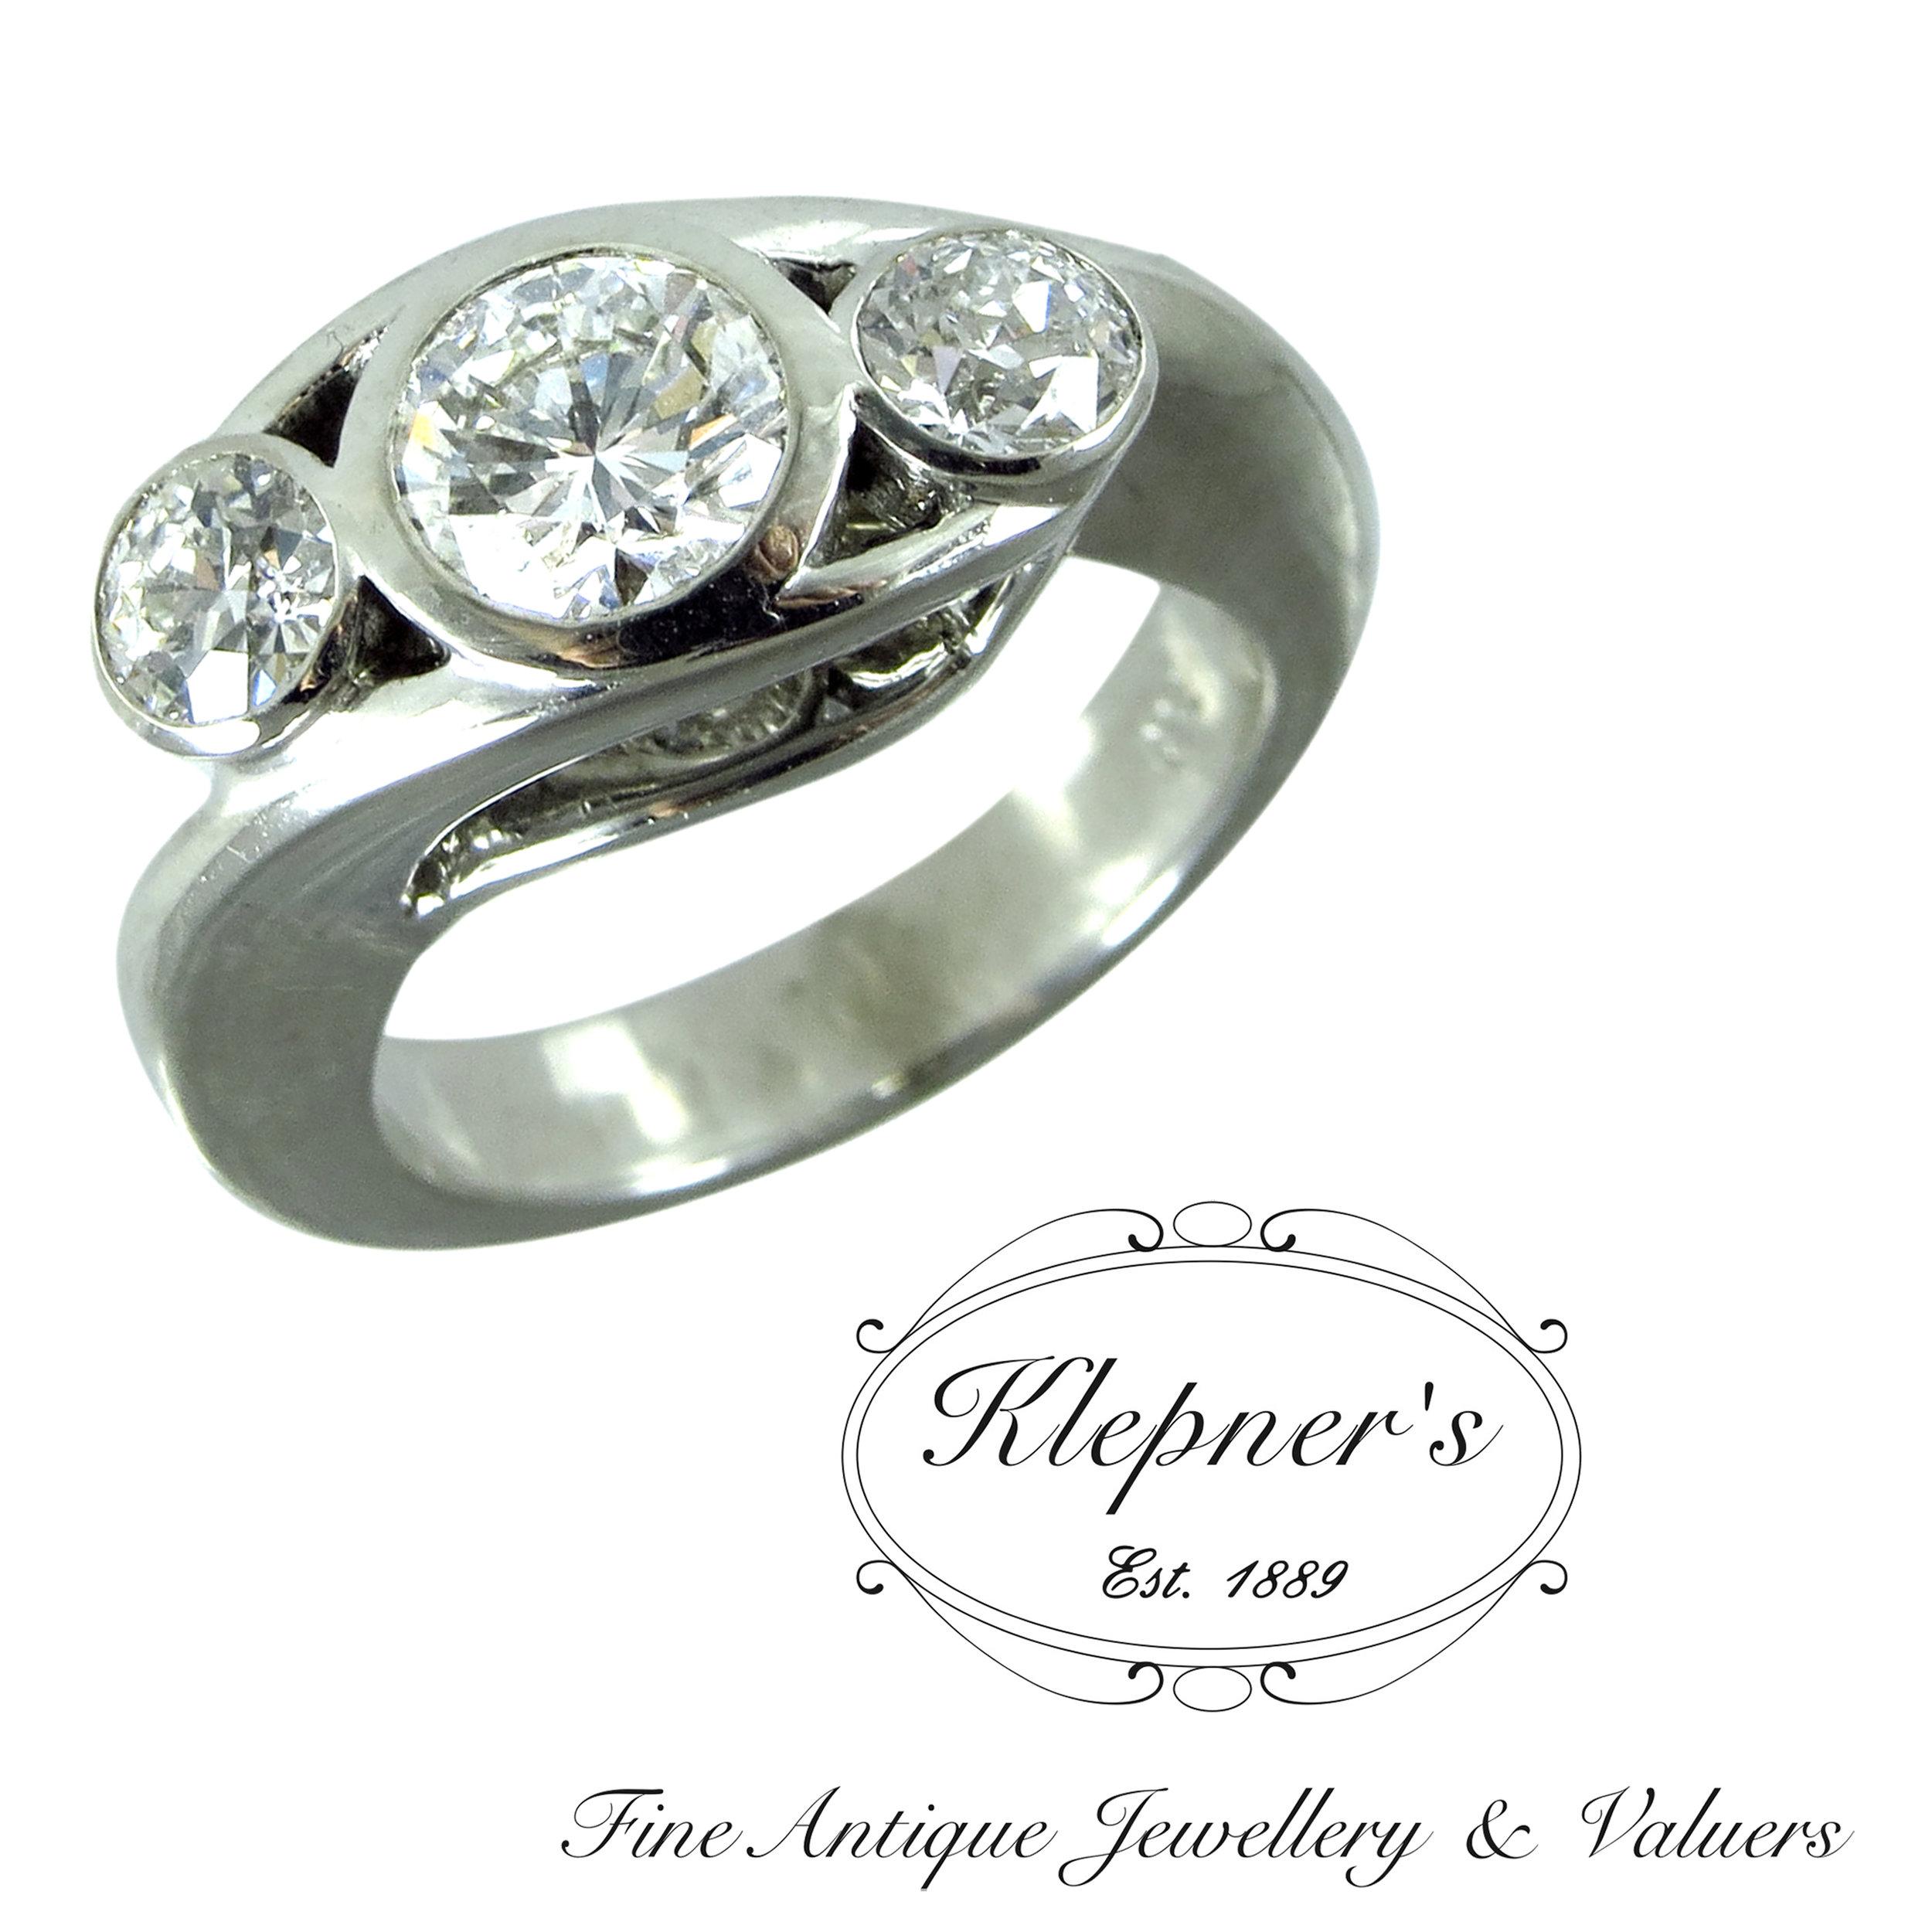 18ct white gold Modern three stone diamond ring, using clients diamonds.